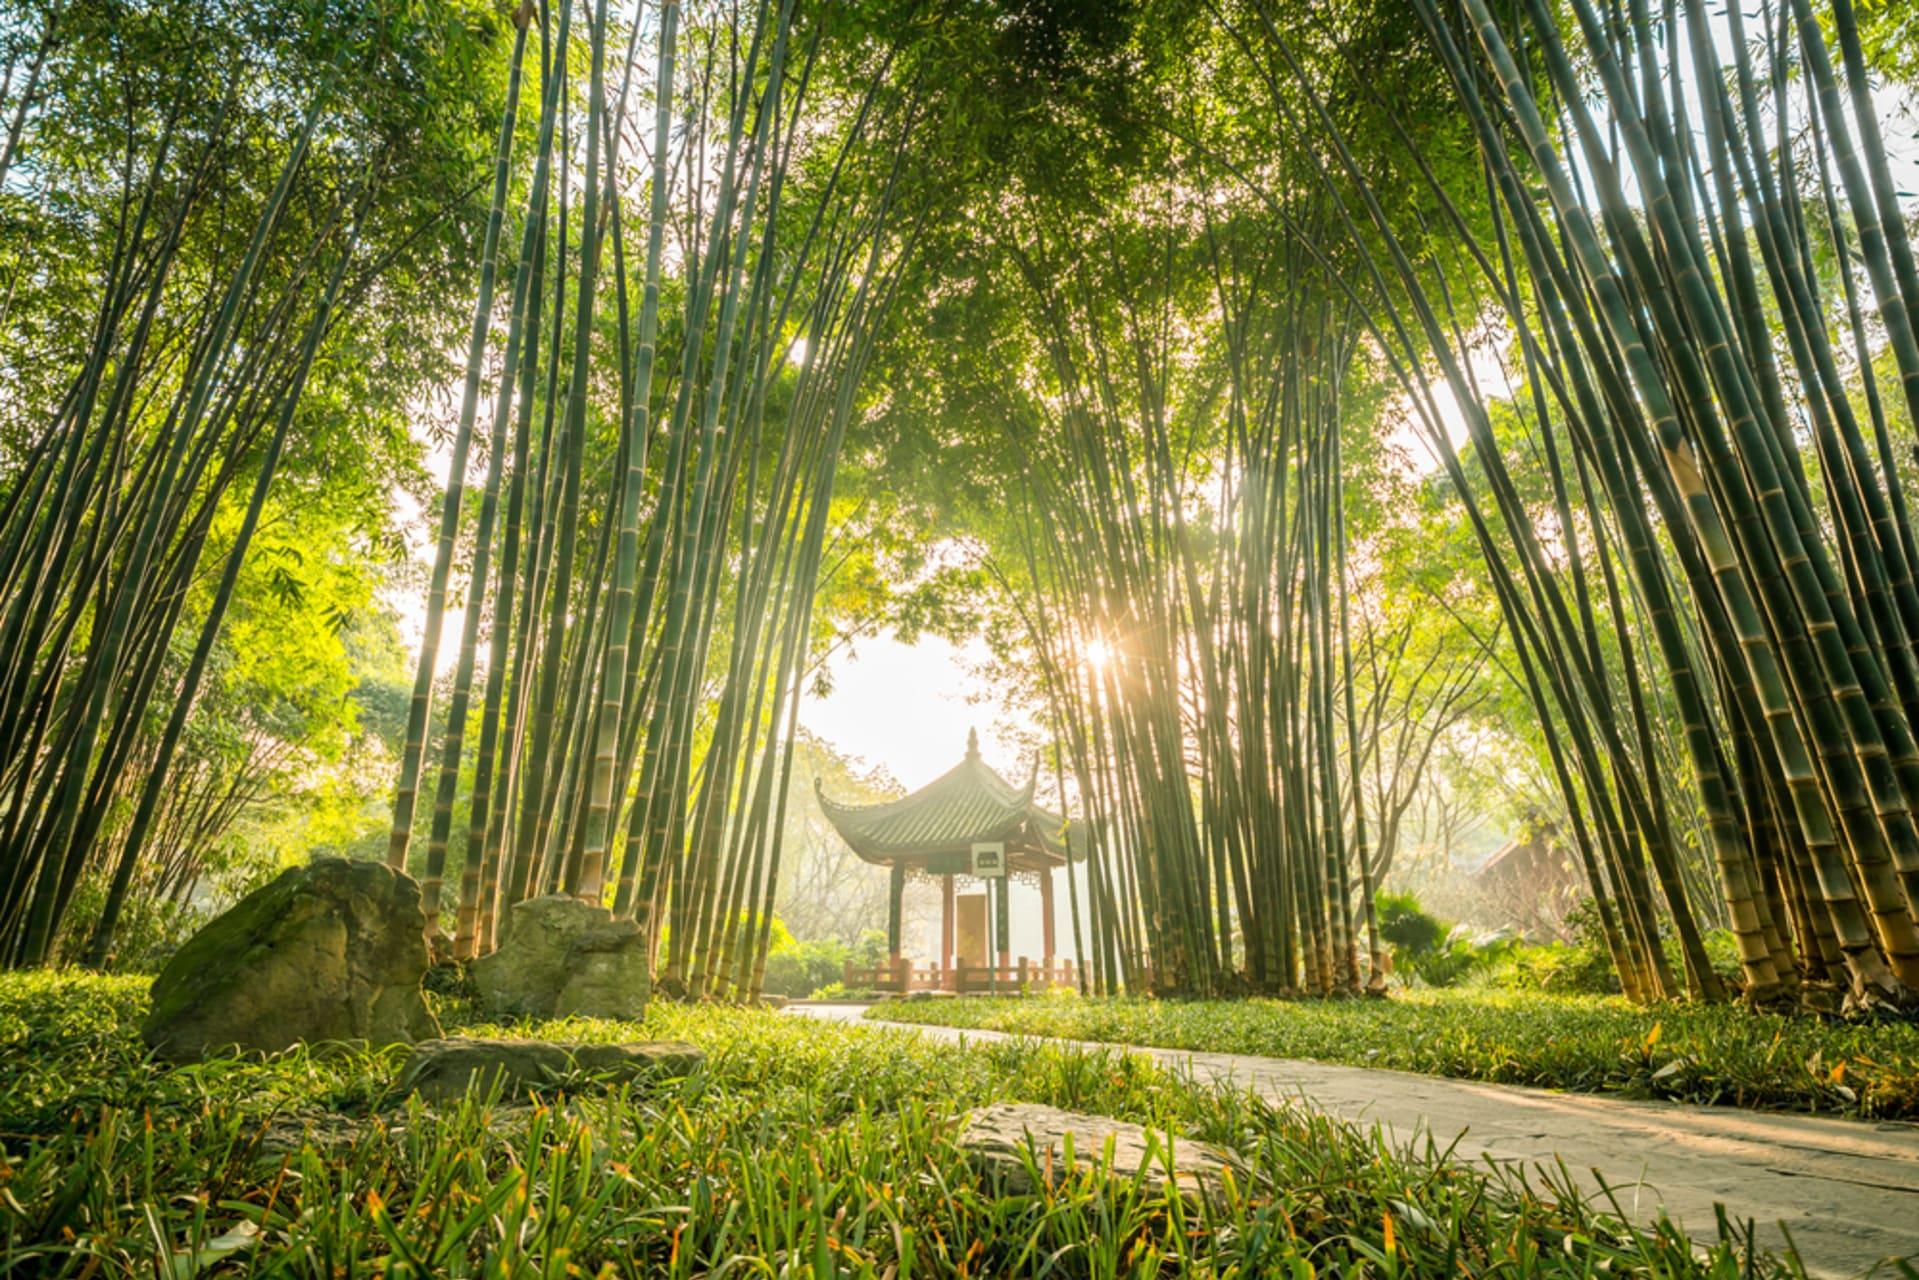 Chengdu - Chengdu Park with Ear-Cleaning Custom